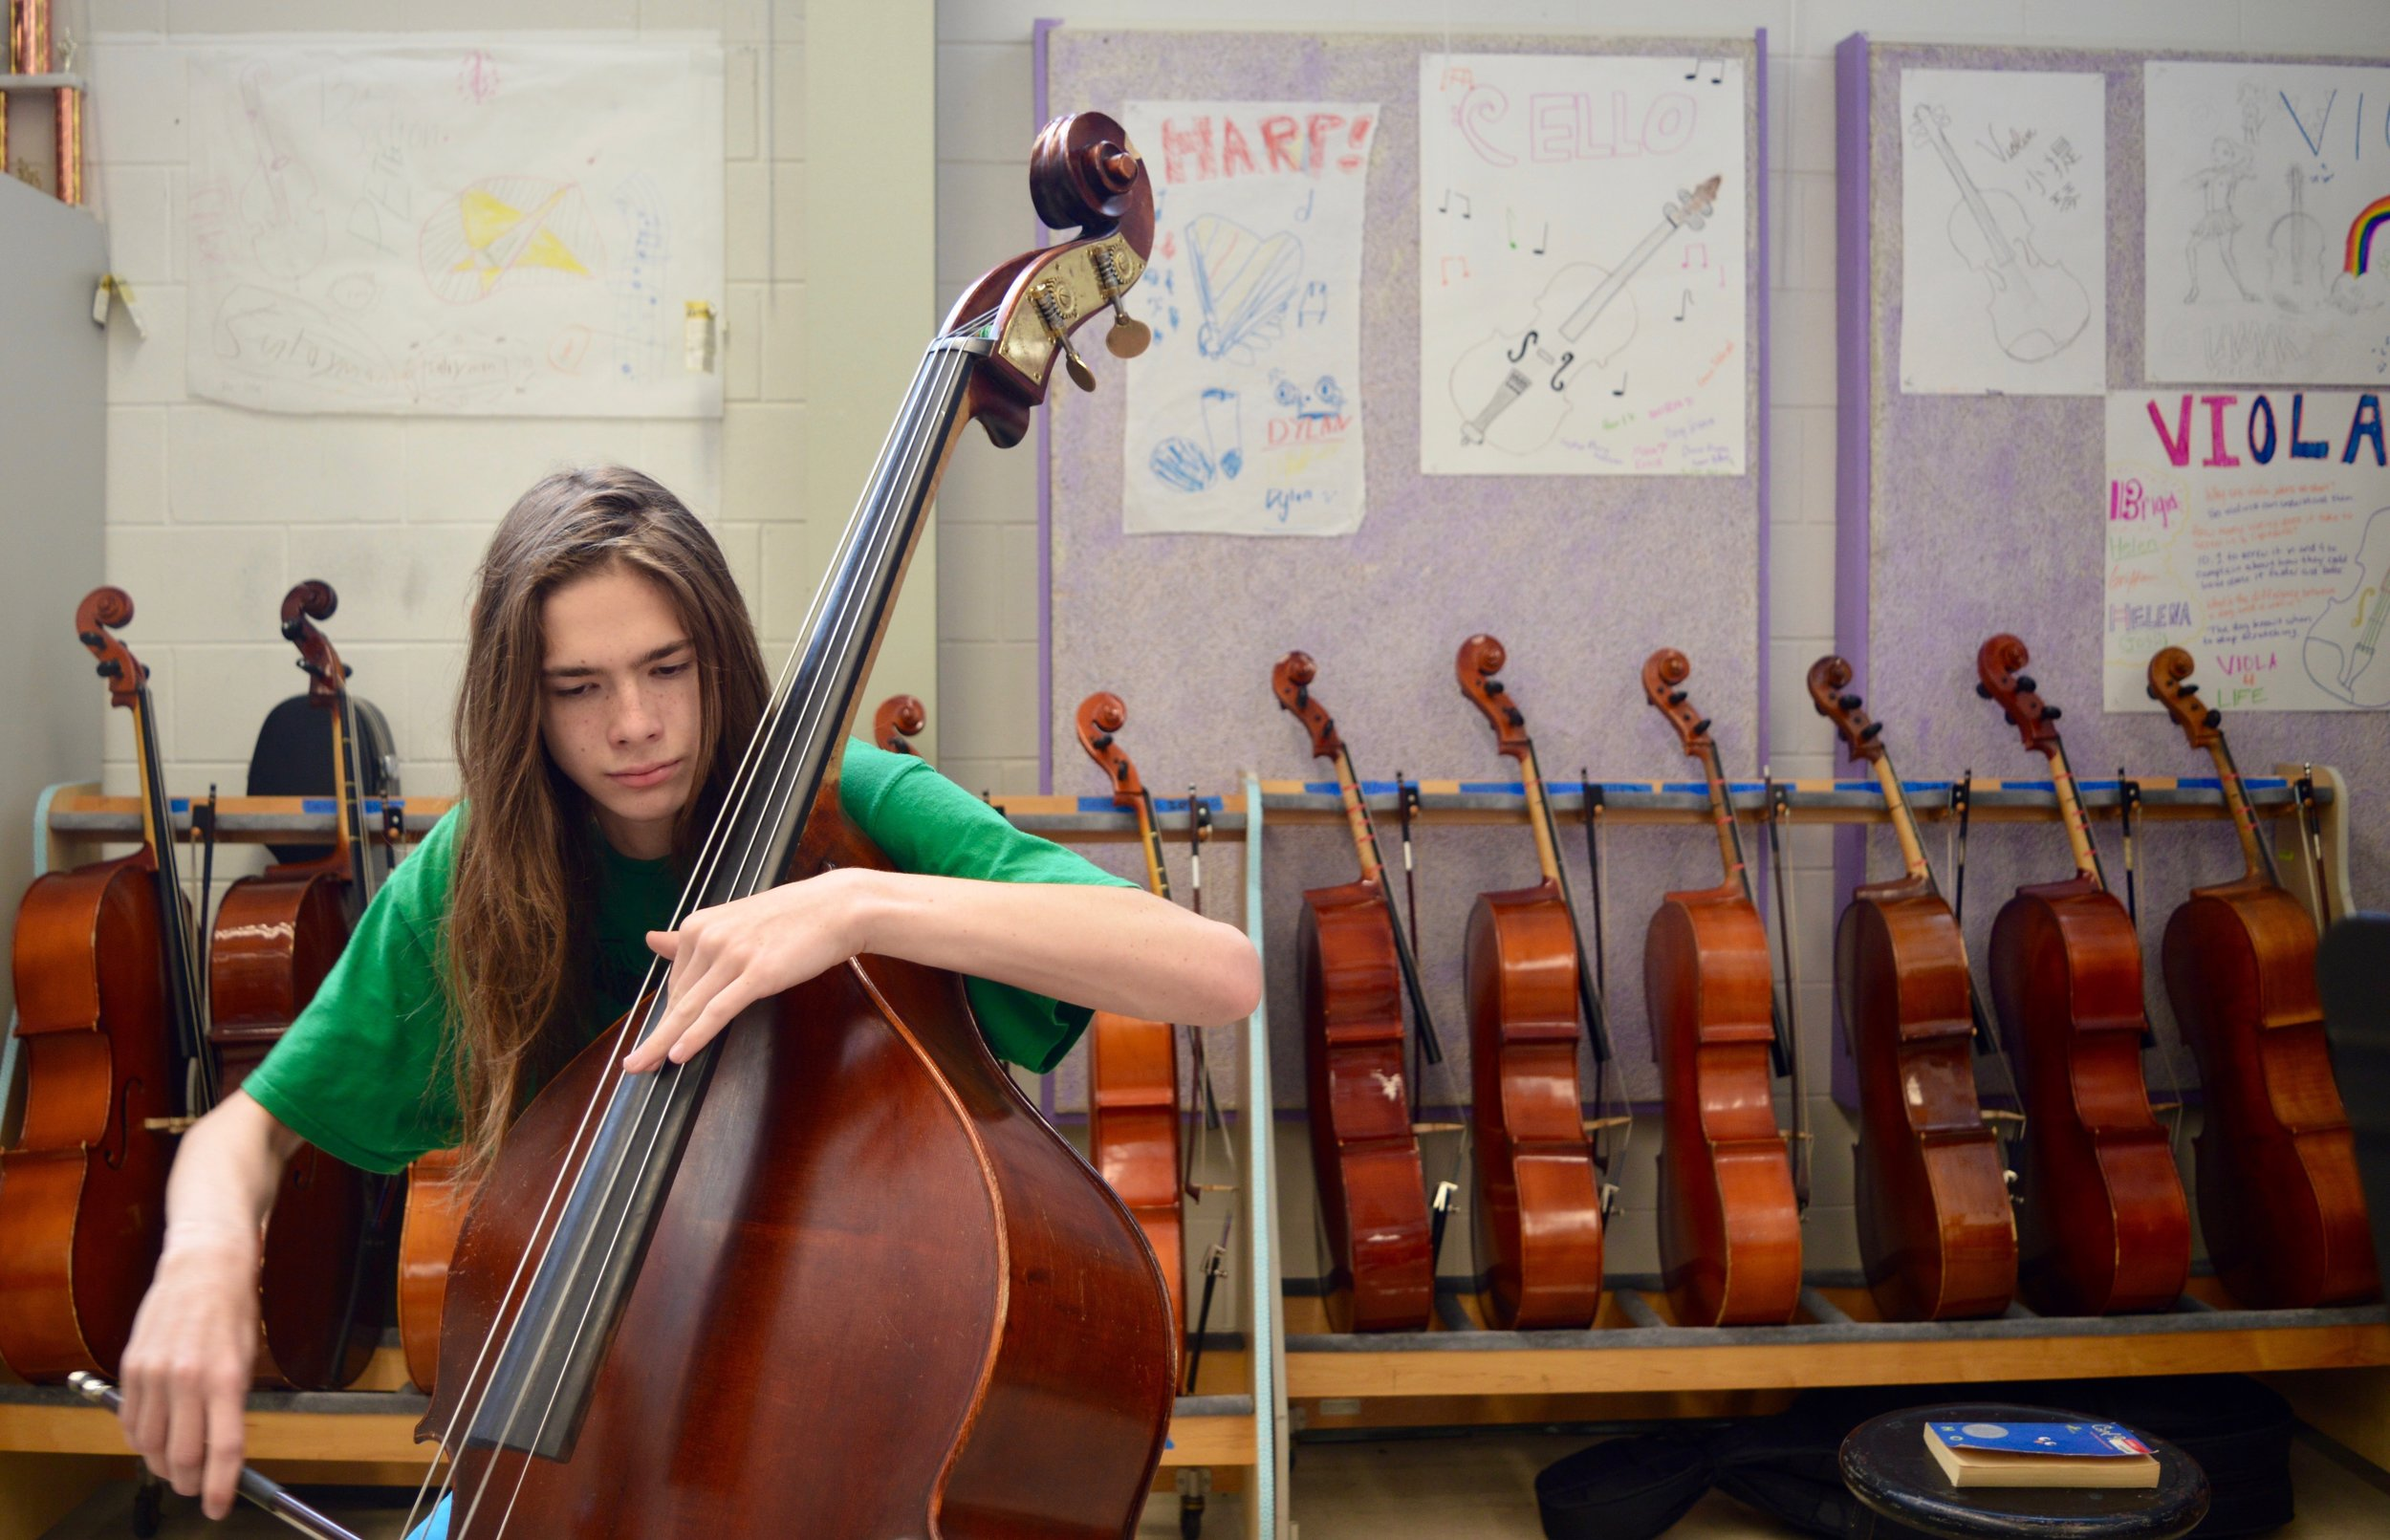 orchestra_07_05_18_bassplayer_SEC.jpg